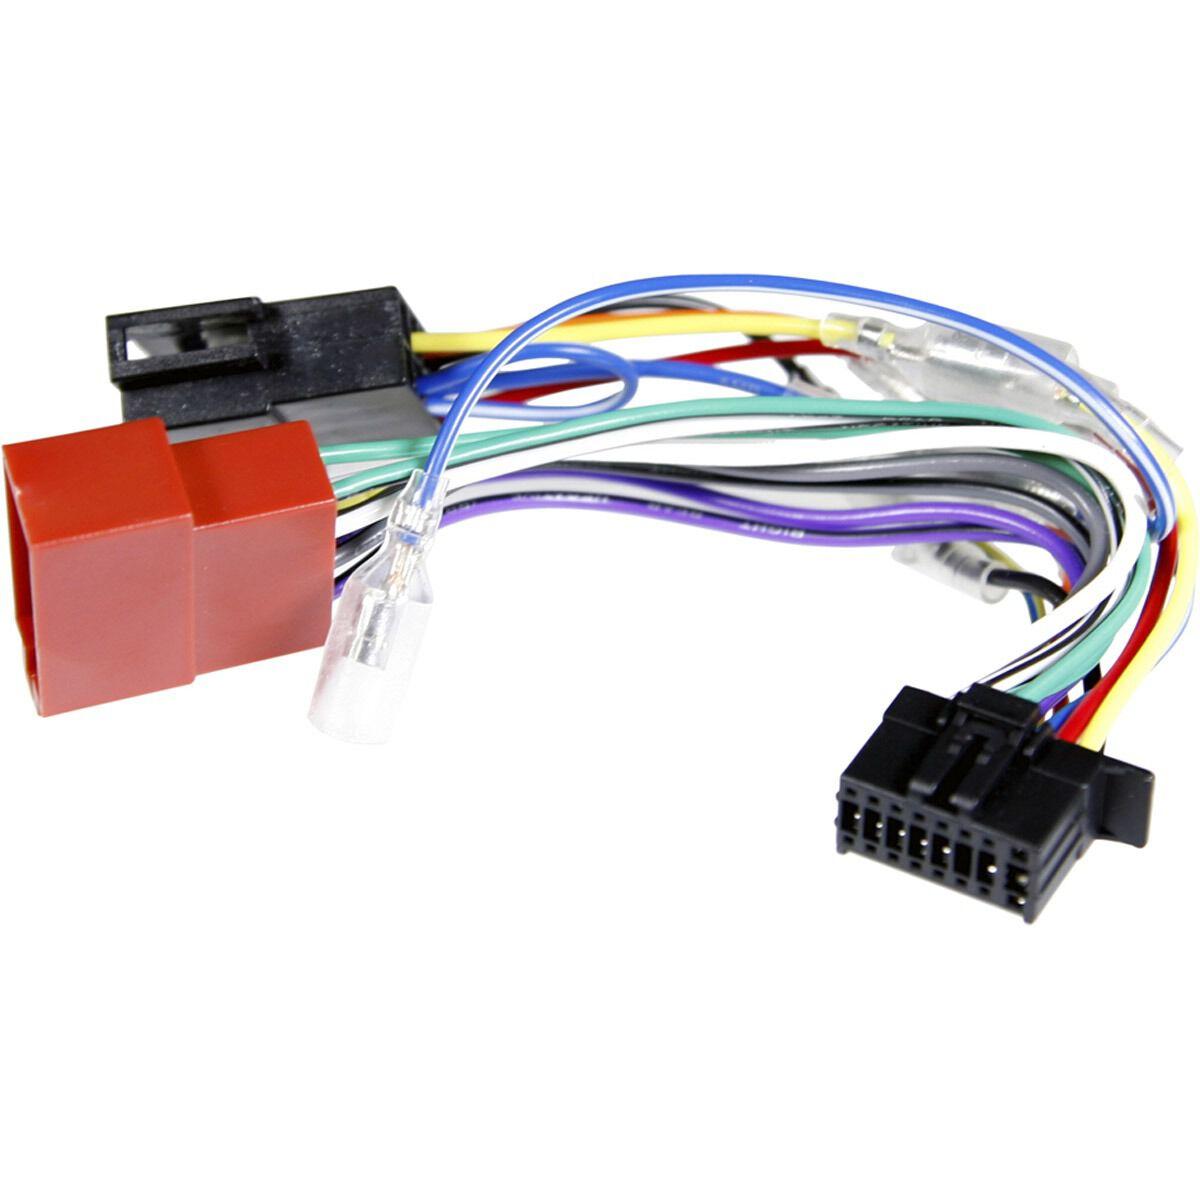 wiring jvc diagram kdsr81bt [ 1200 x 1200 Pixel ]